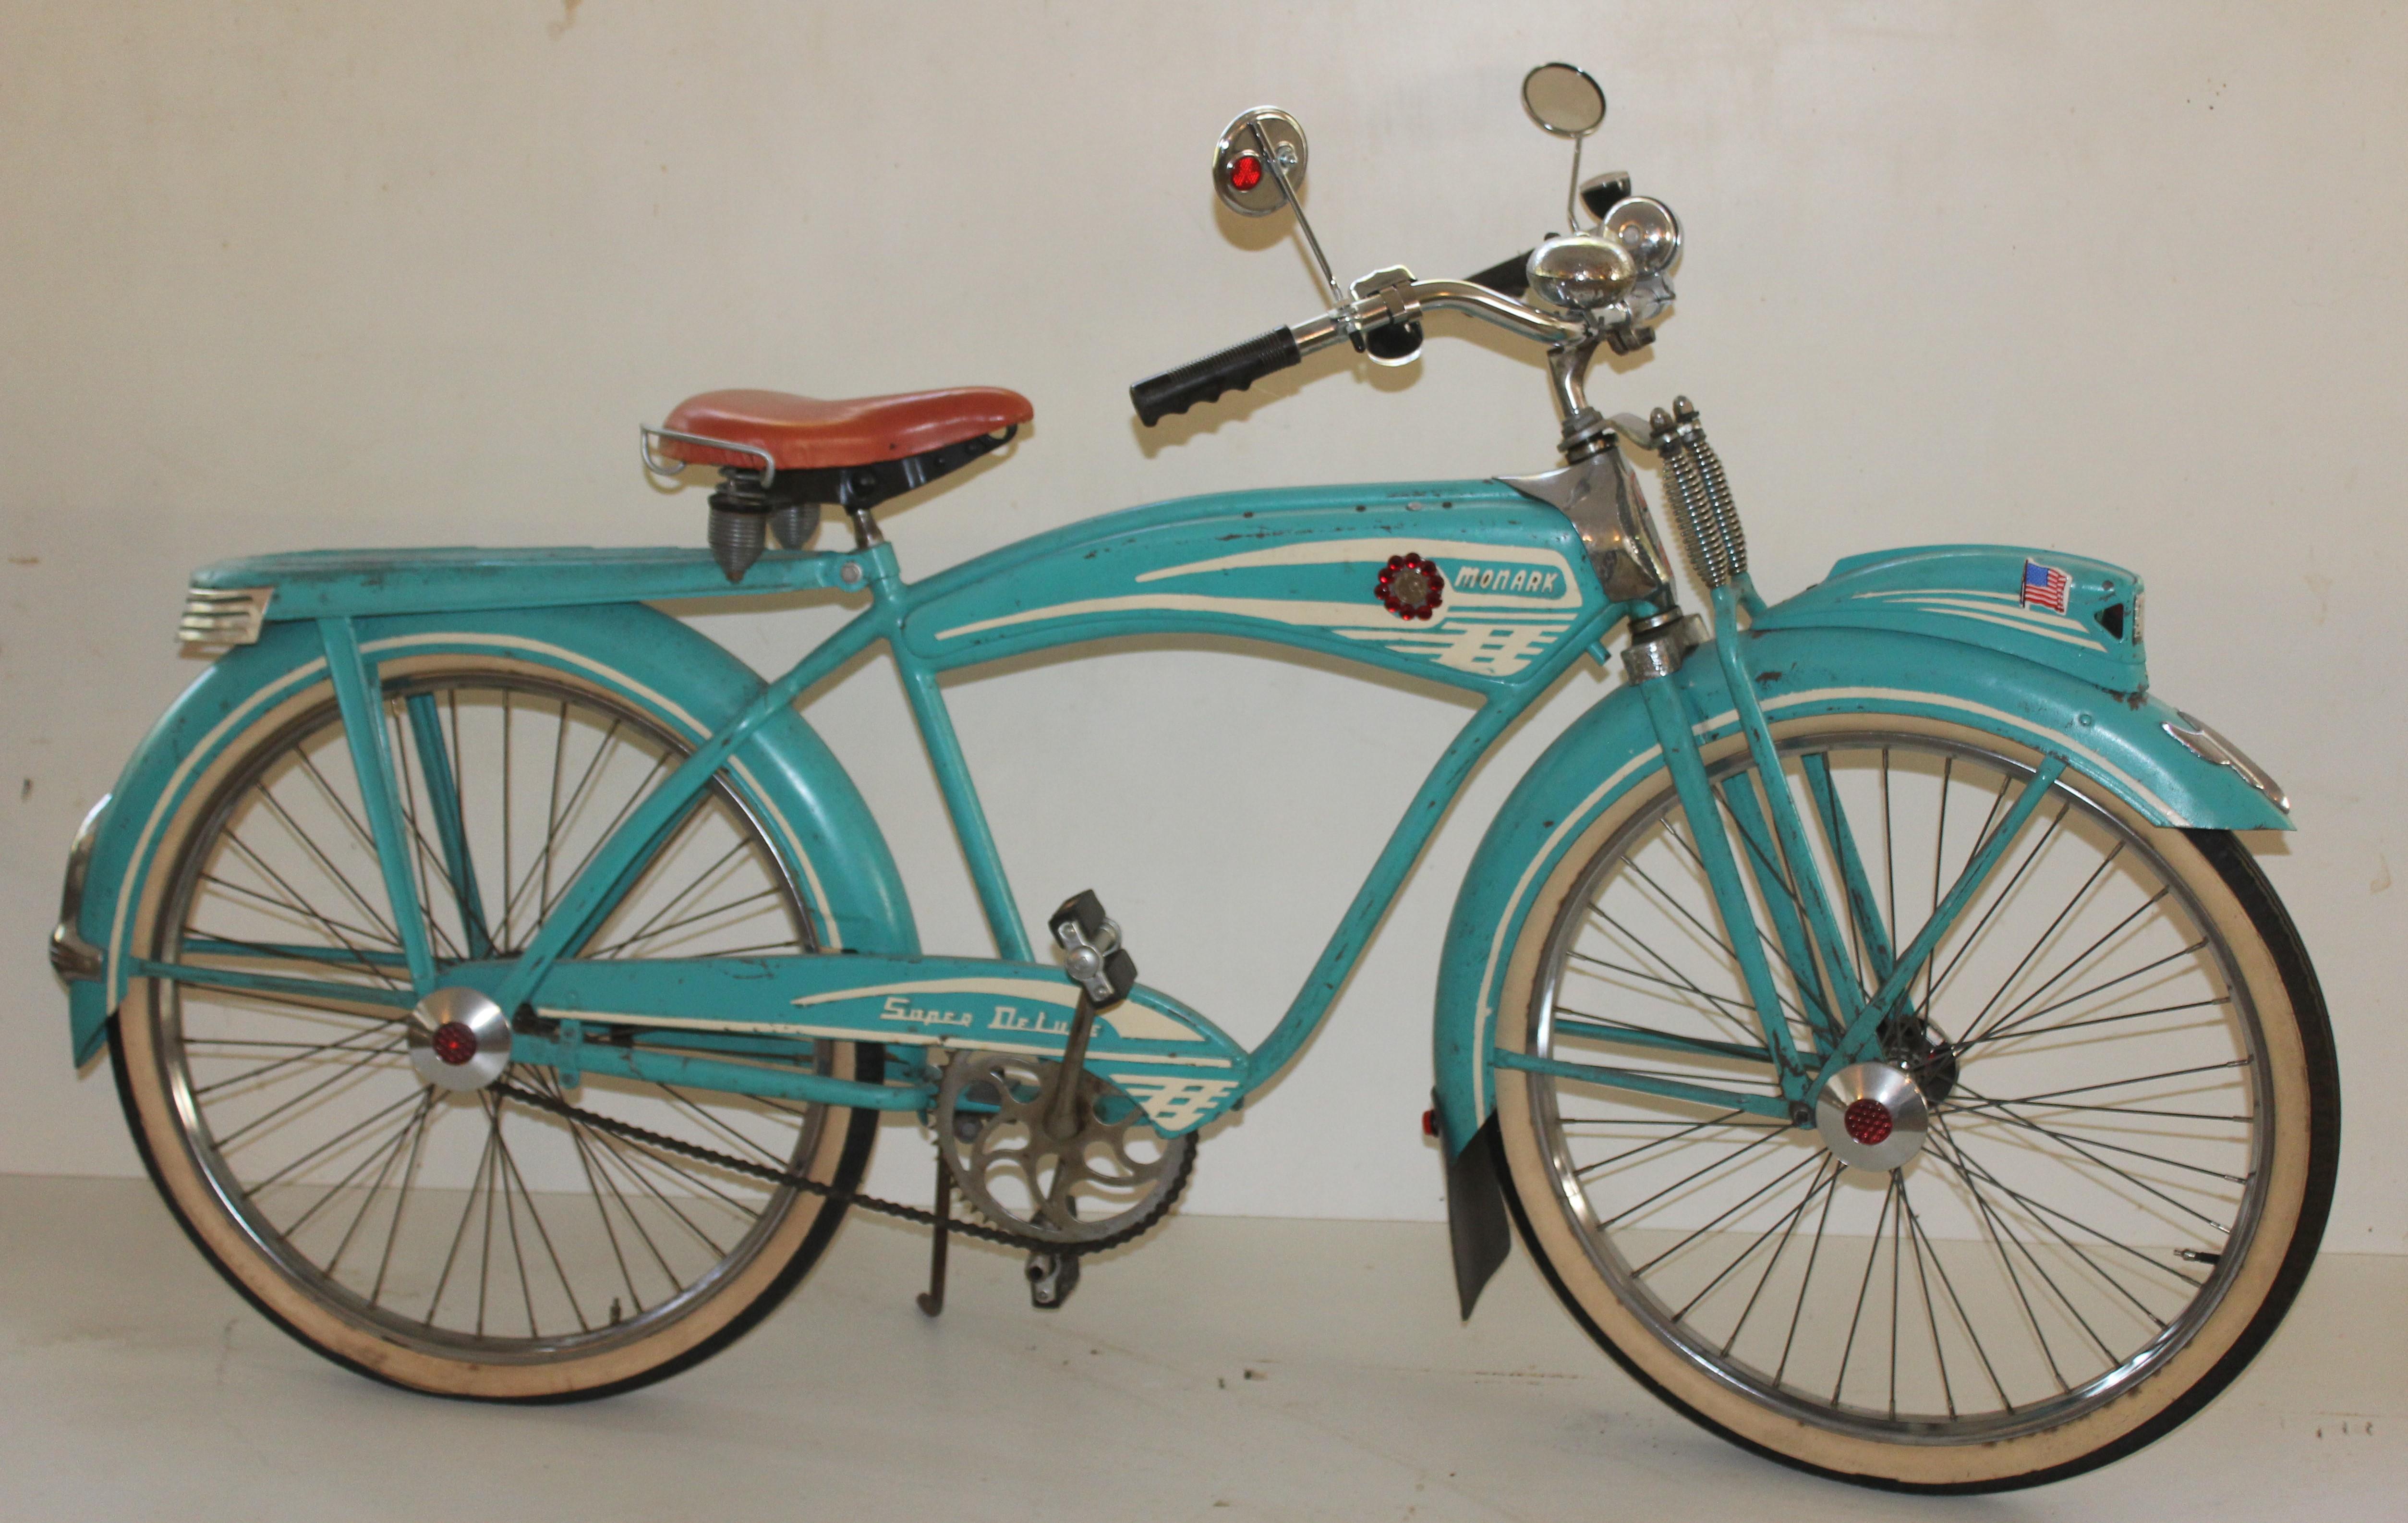 https://0201.nccdn.net/1_2/000/000/0a4/e29/monark-bicycle.jpg